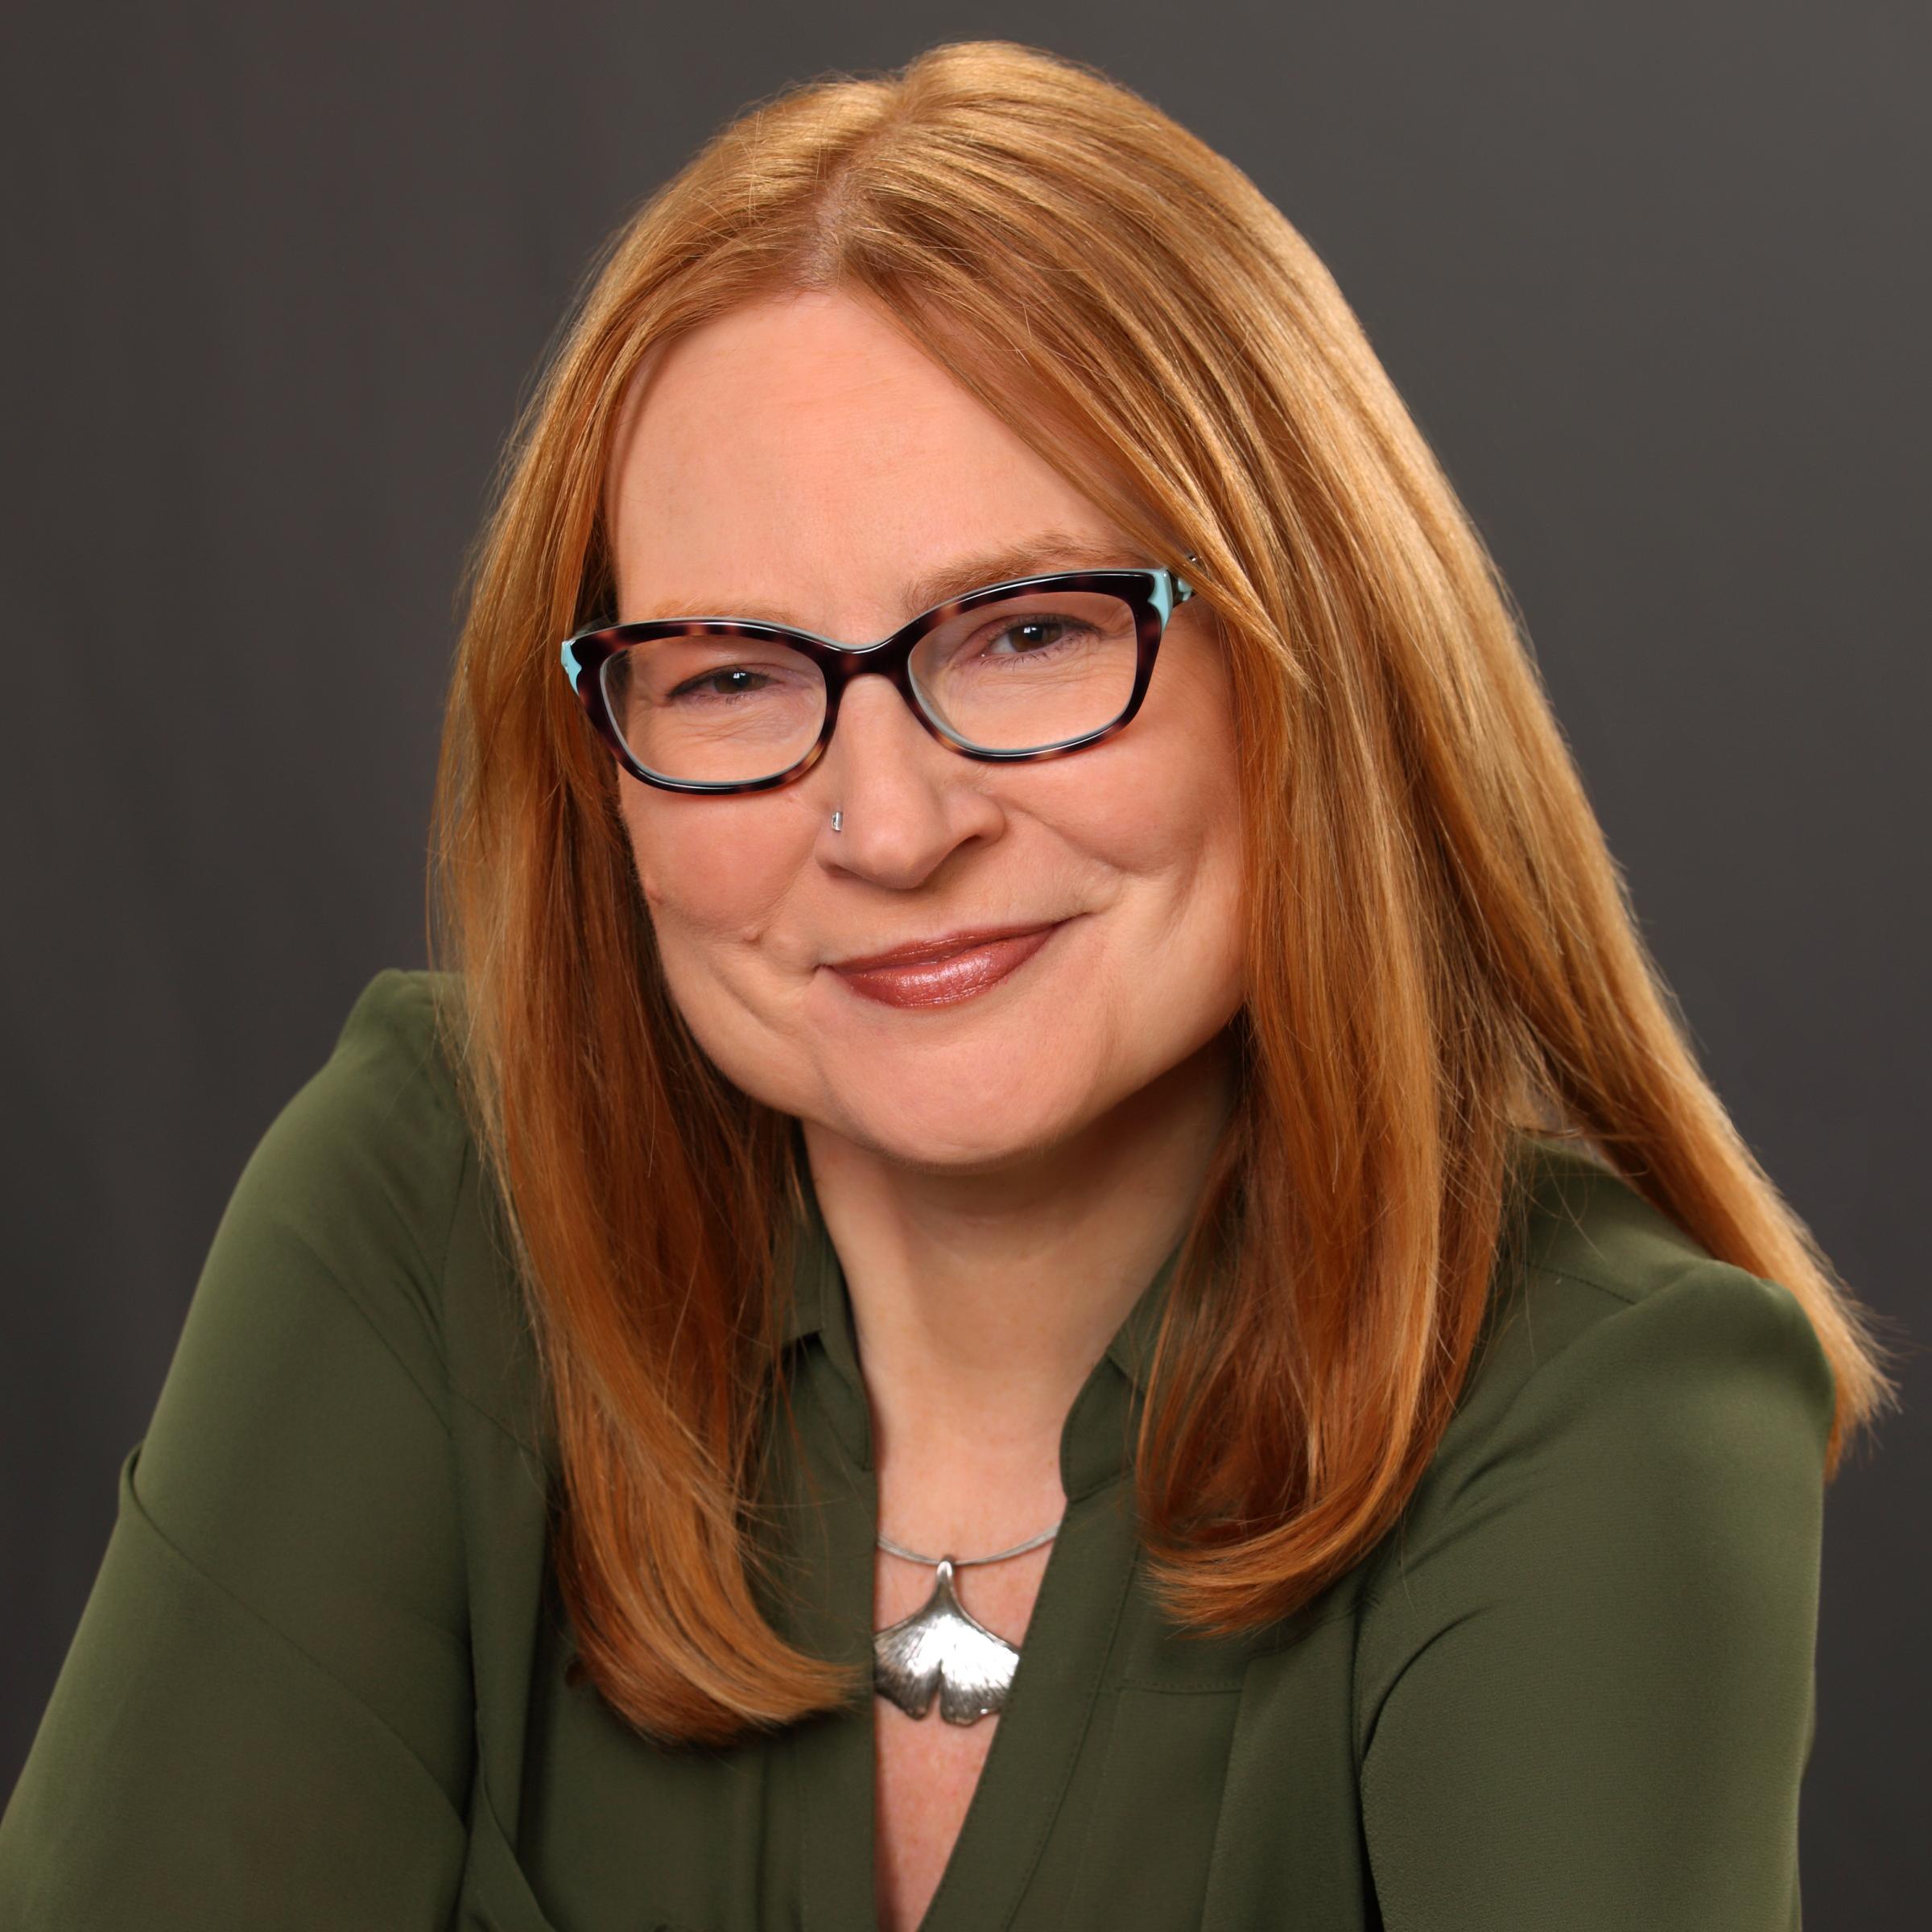 Carolyn R. Mericle